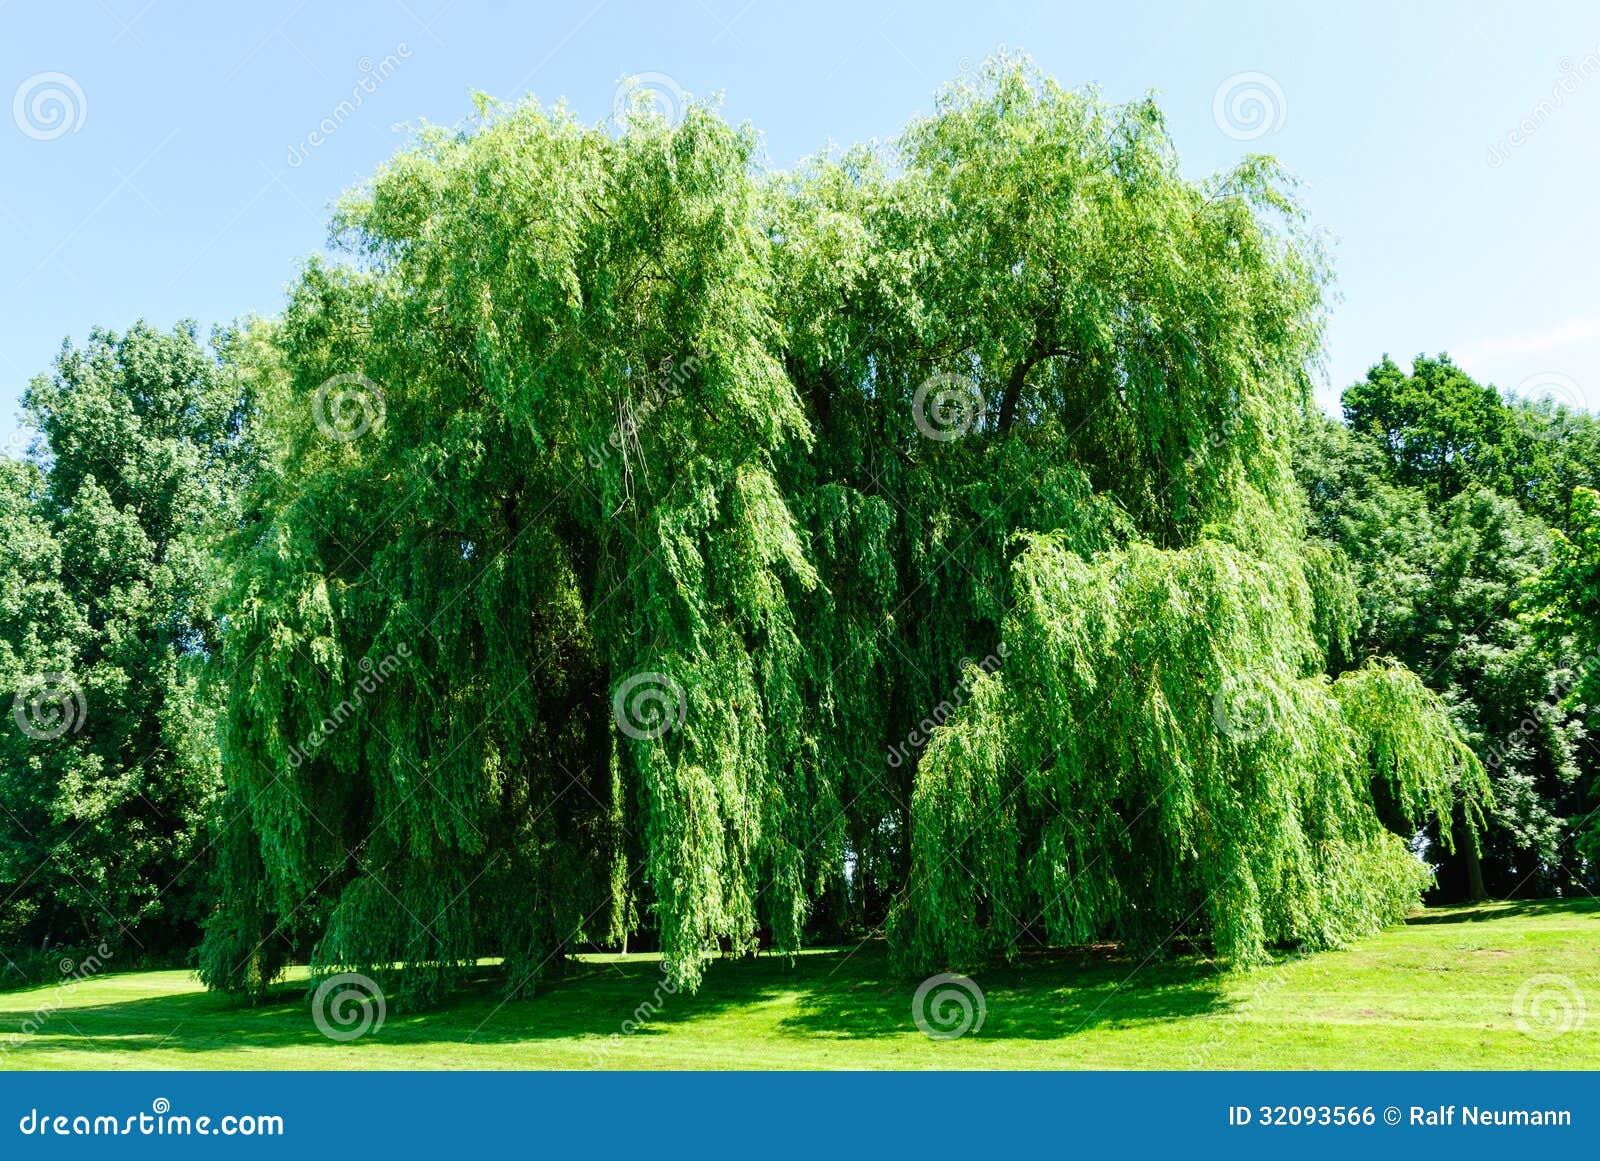 weeping willows salix alba tristis royalty free stock image image 32093566. Black Bedroom Furniture Sets. Home Design Ideas